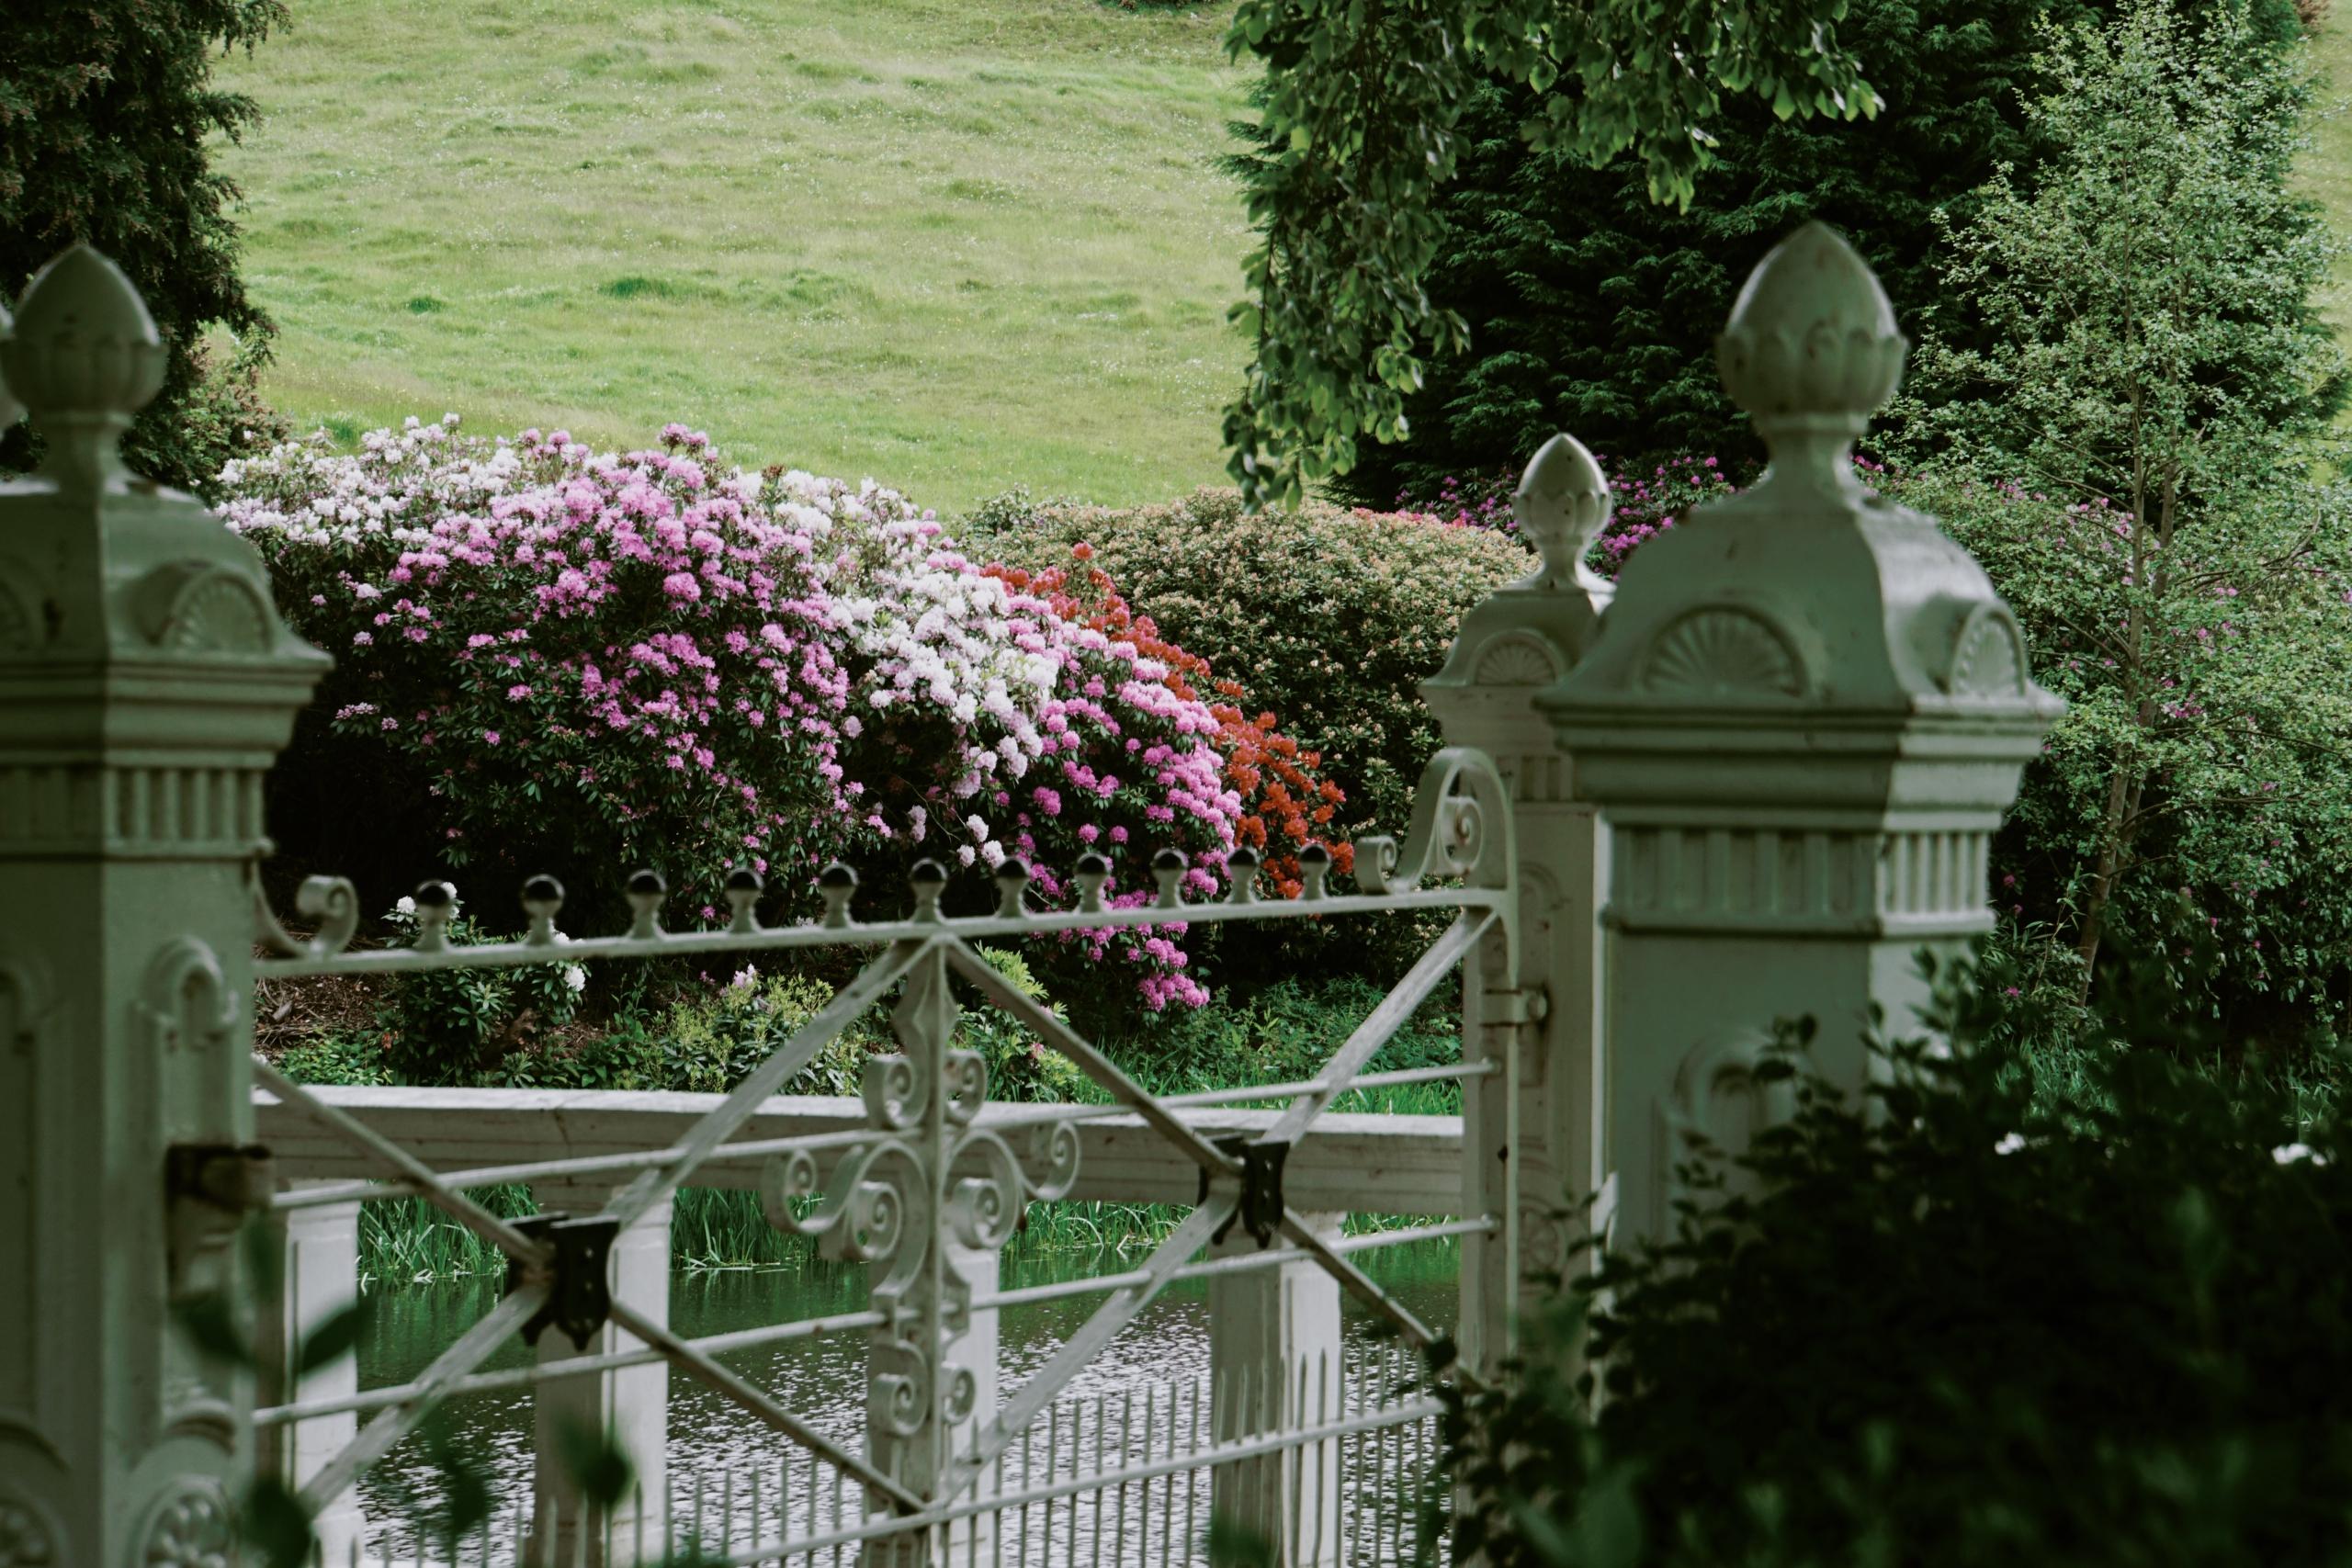 Raithwaite Lake and Gardens